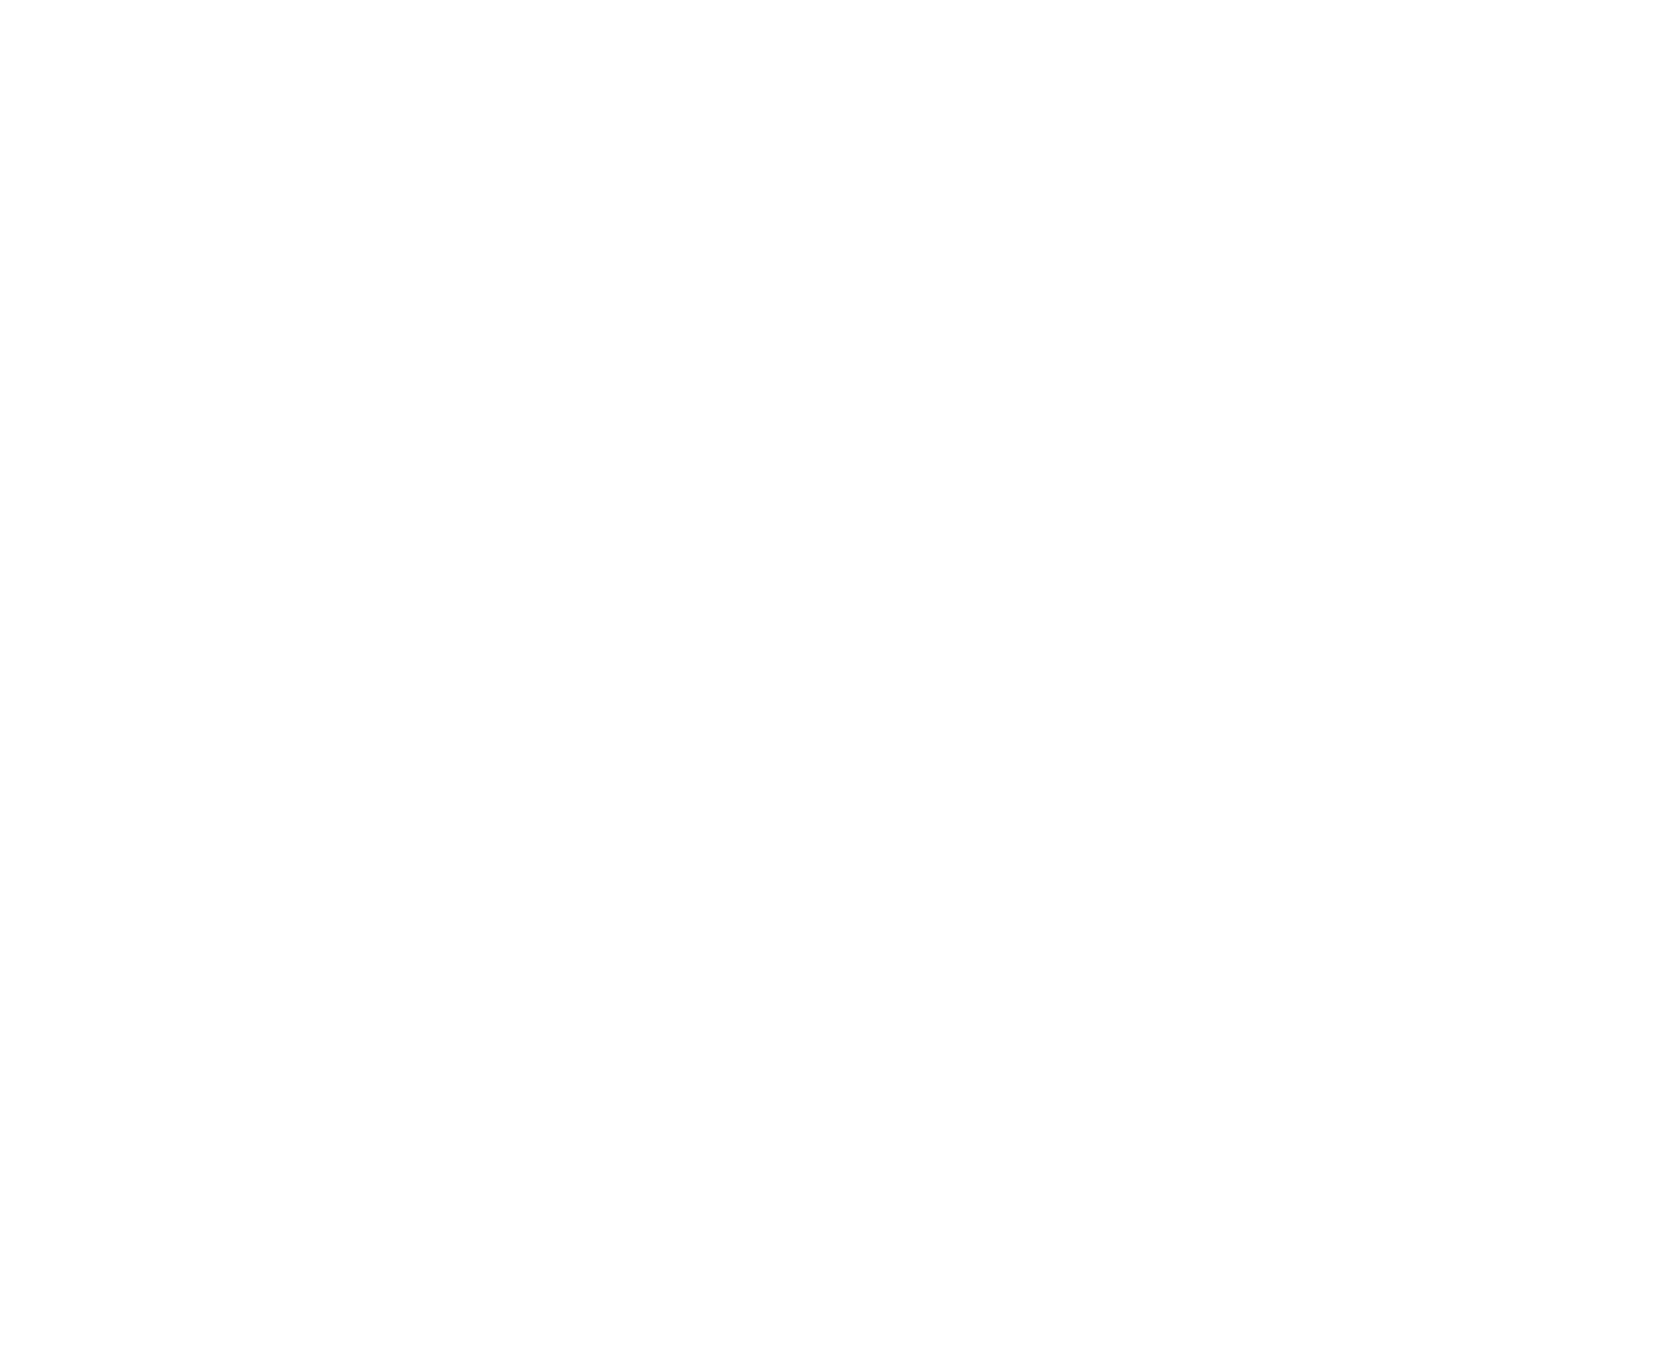 EN Indy Awards logo